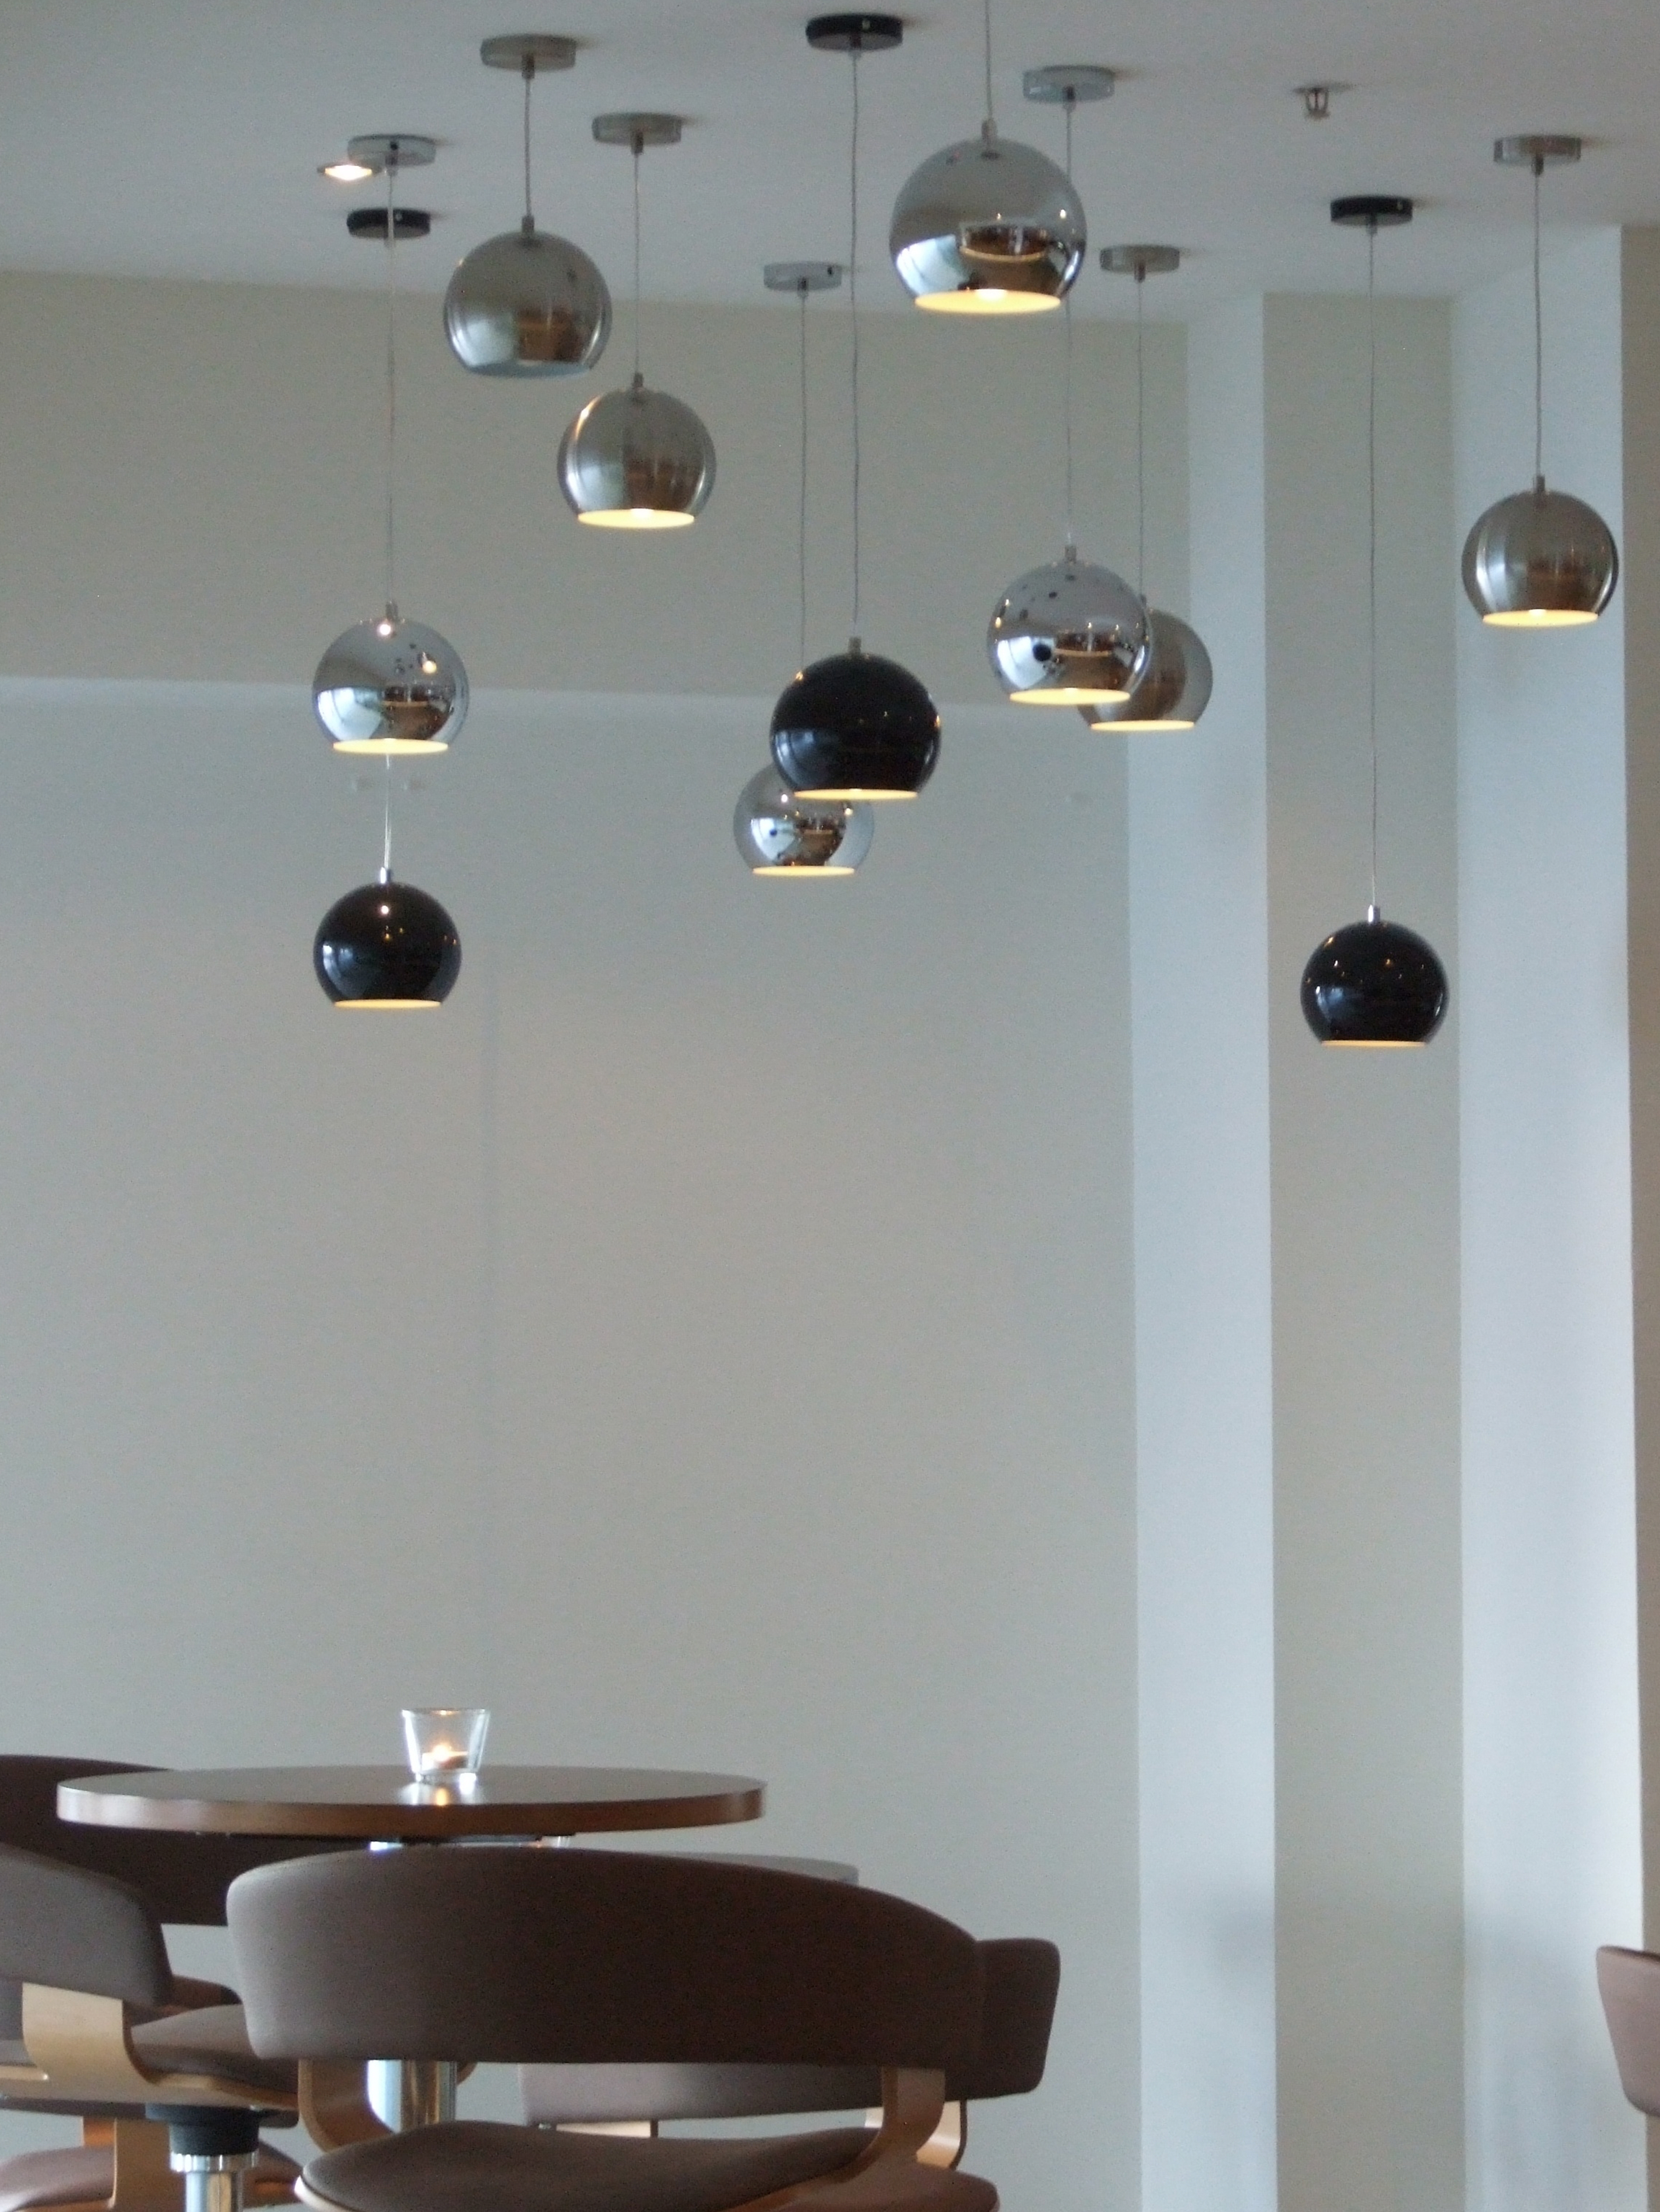 wales-millennium-centre-ffresh-restaurant-moleta-munro-2